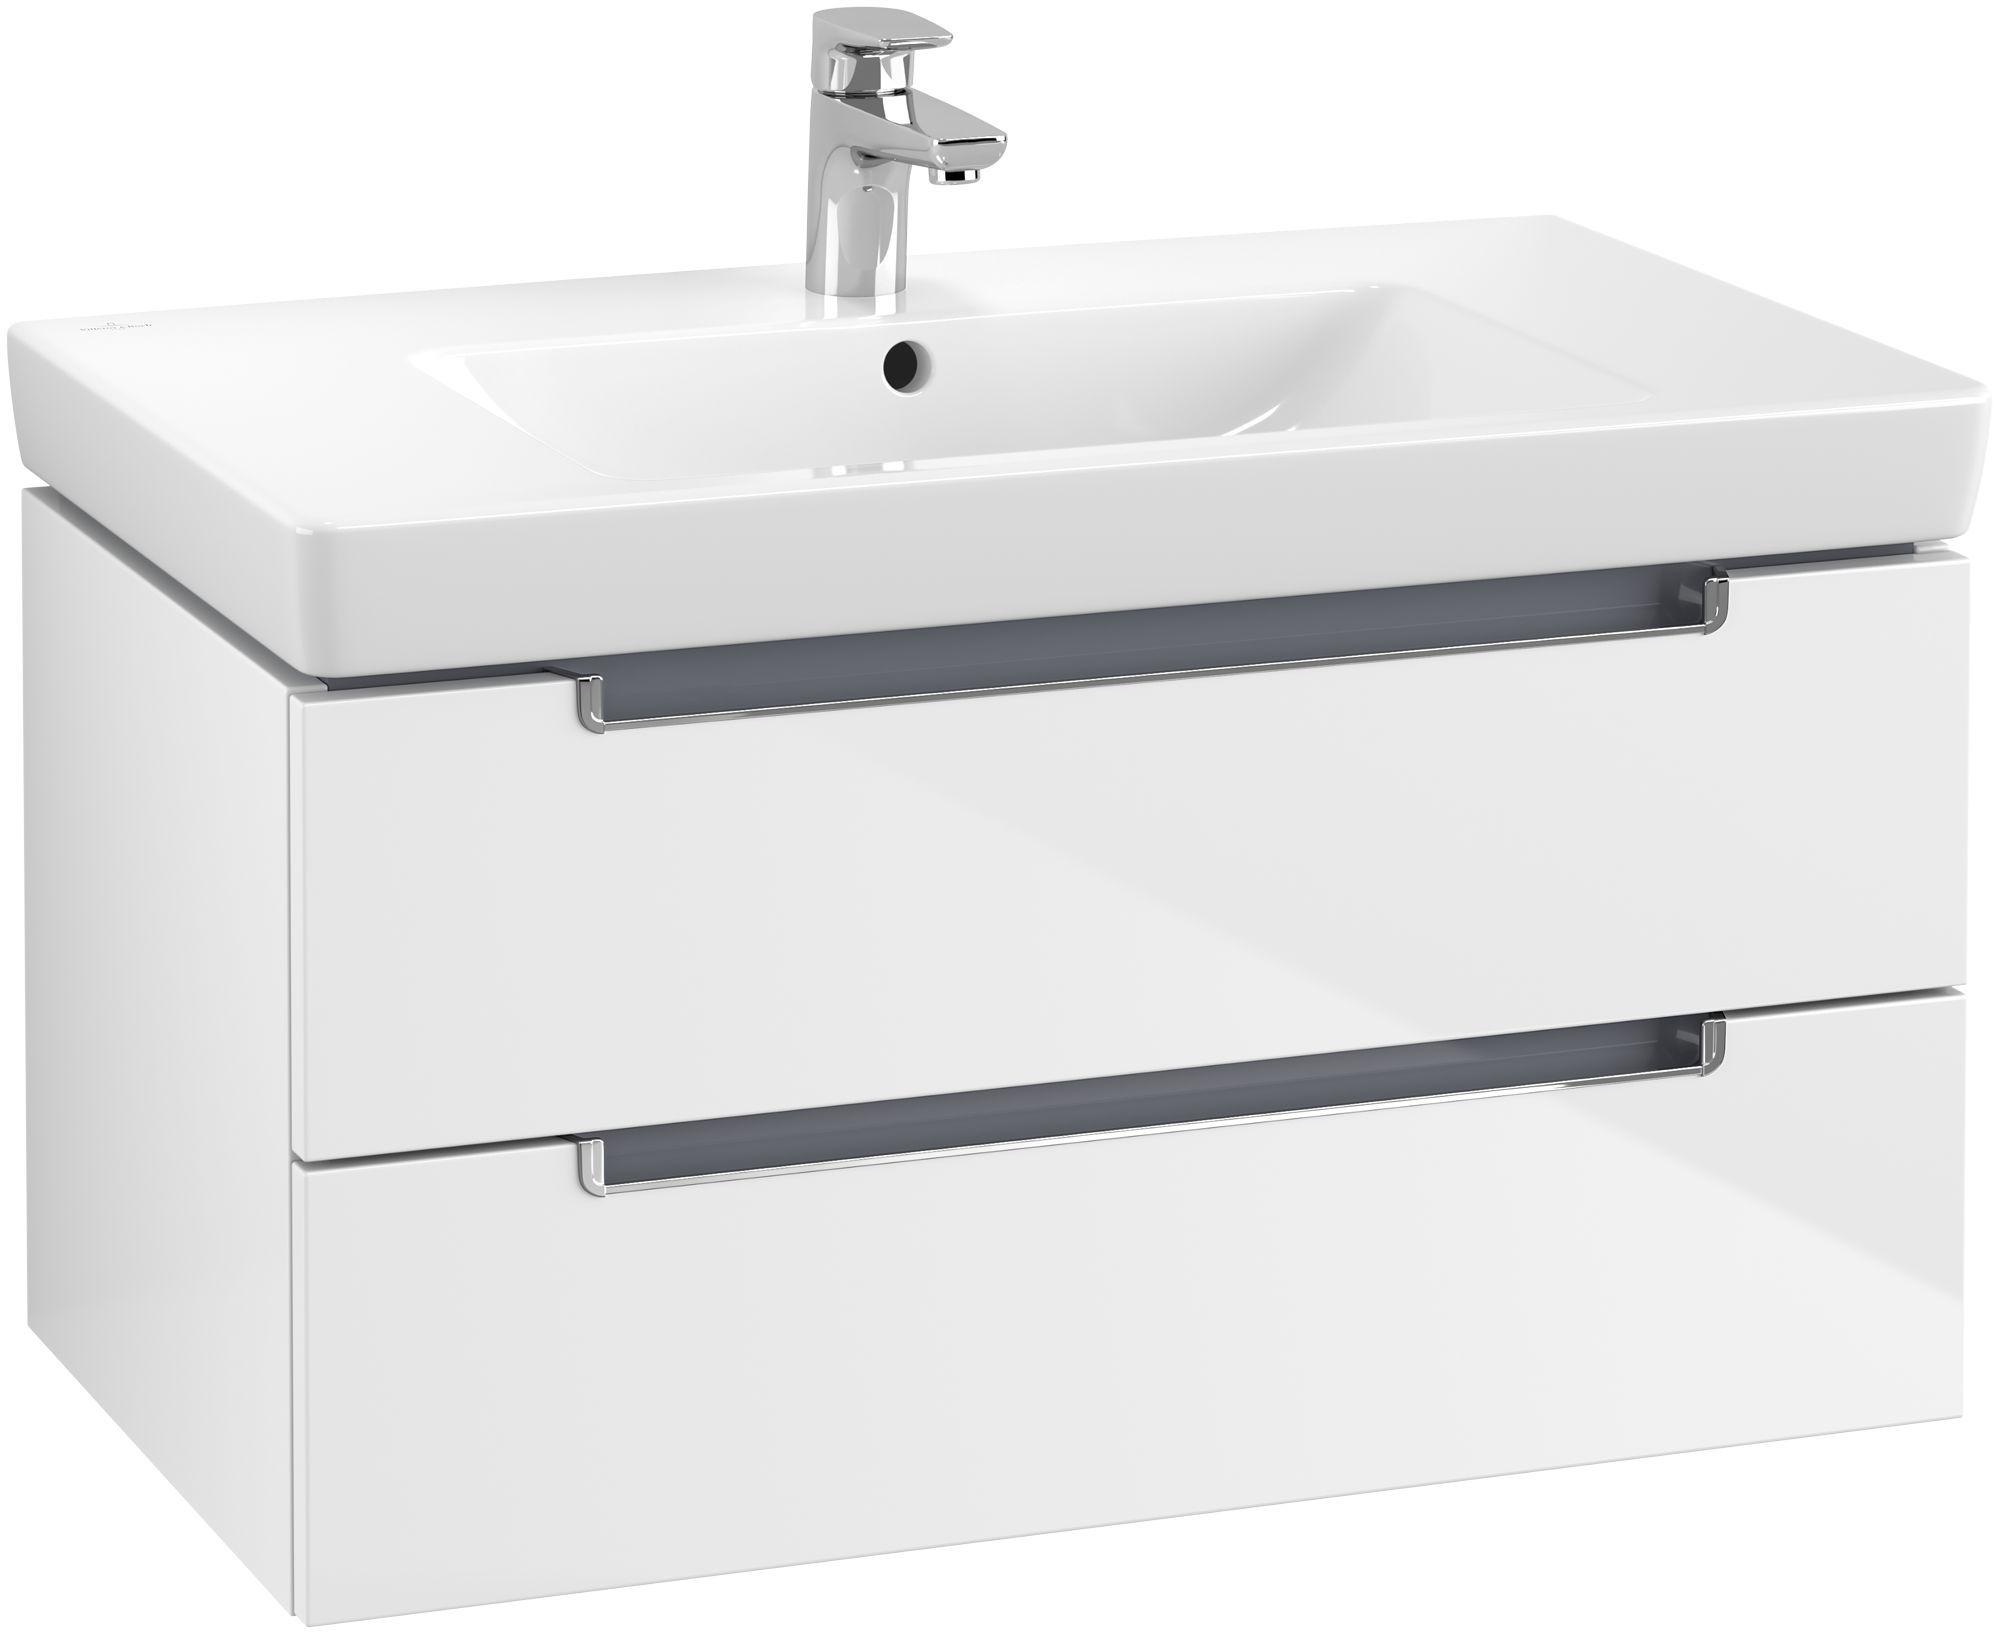 Villeroy & Boch Subway 2.0 Waschtischunterschrank 2 Auszüge B:787xT:449xH:420mm glossy weiß Griffe chrom A68910DH